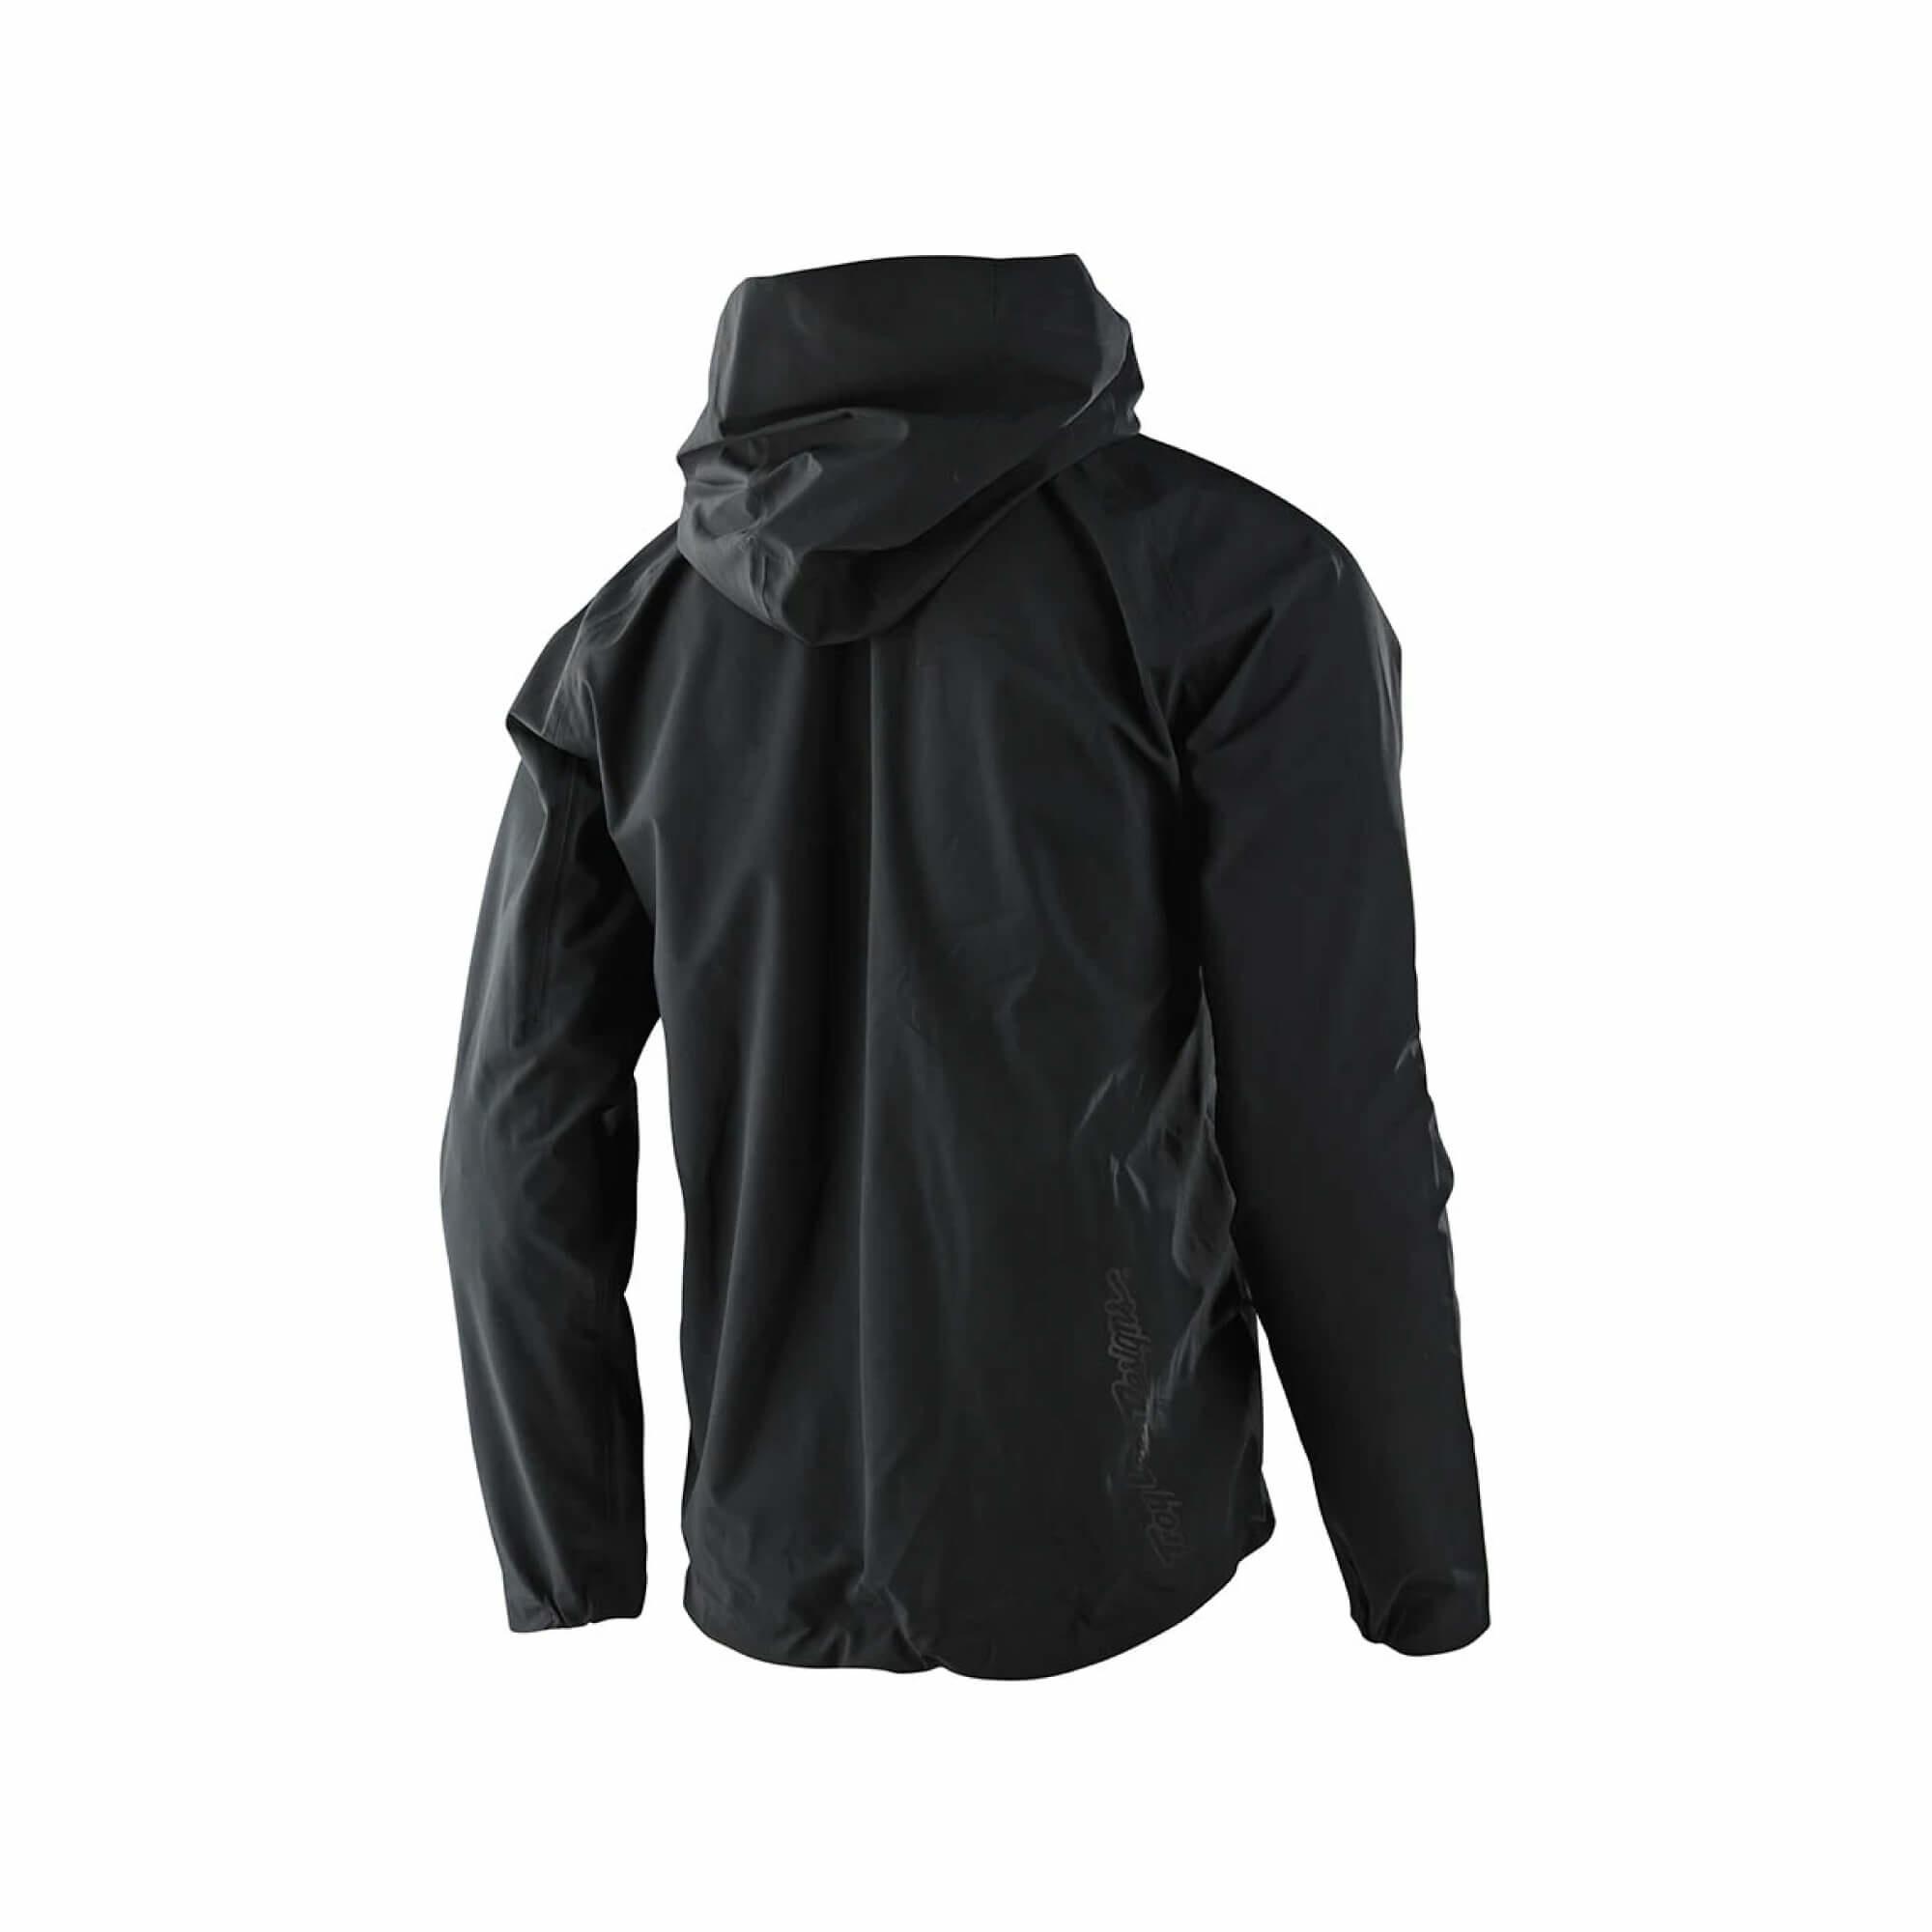 Descent Jacket 2021-2